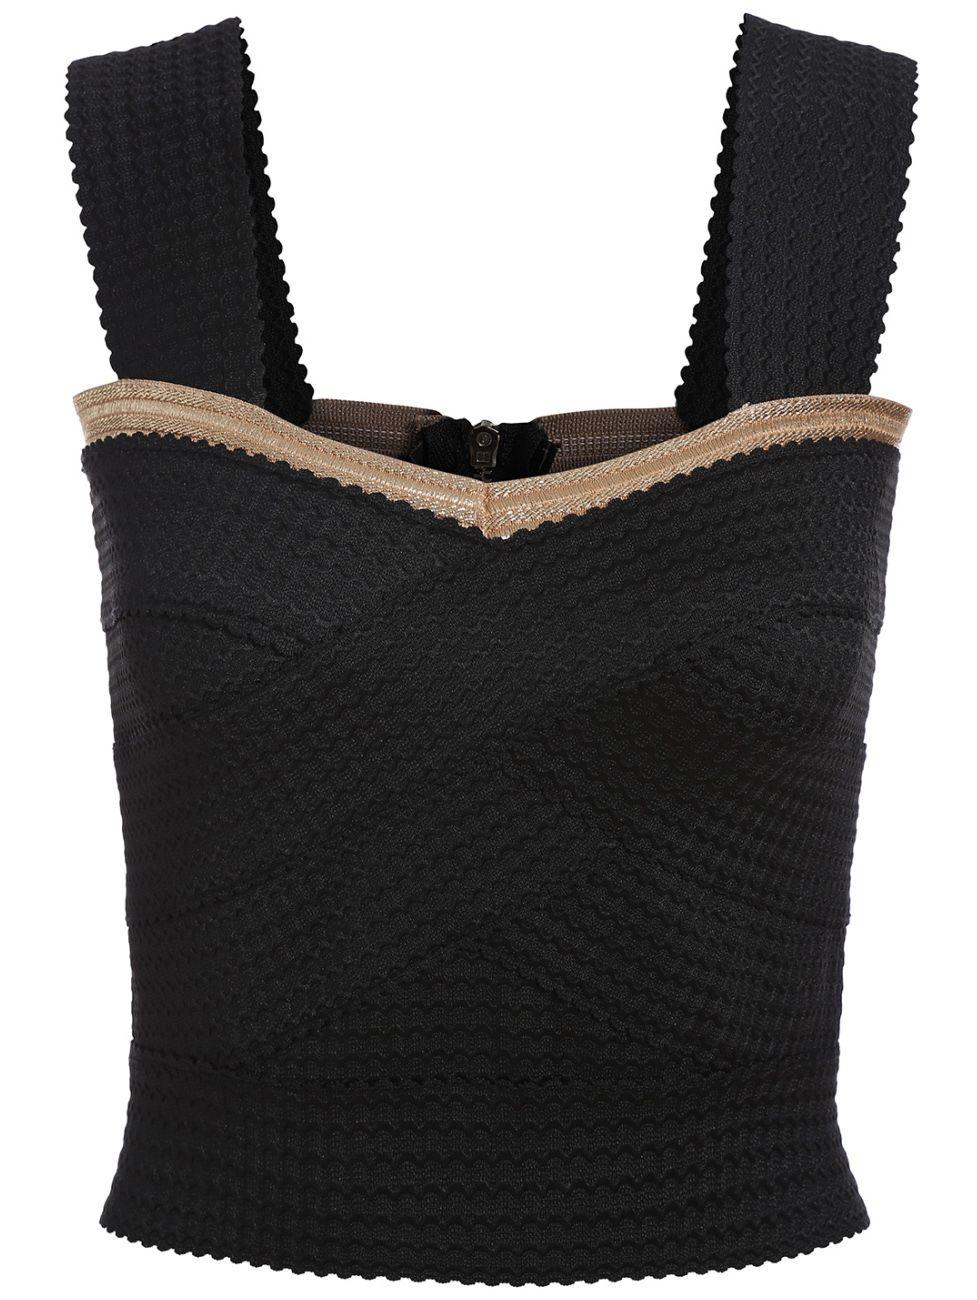 Strap Back Zipper Bandage Cami Top